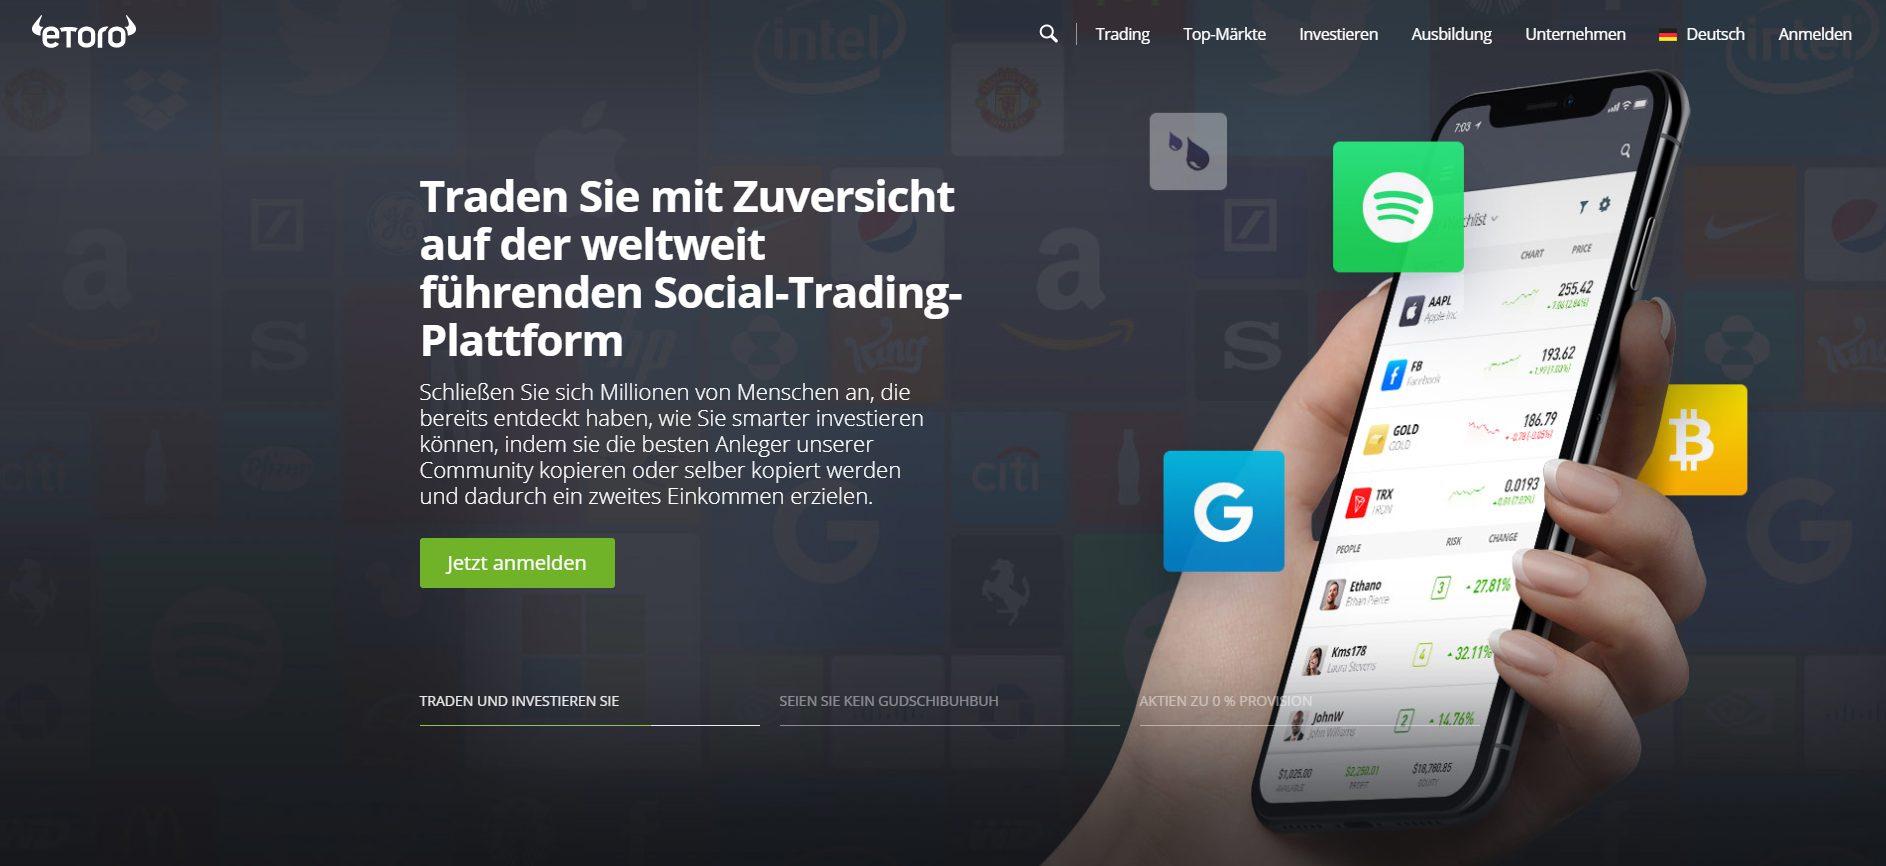 Etoro Forex Broker Webseite Screenshot